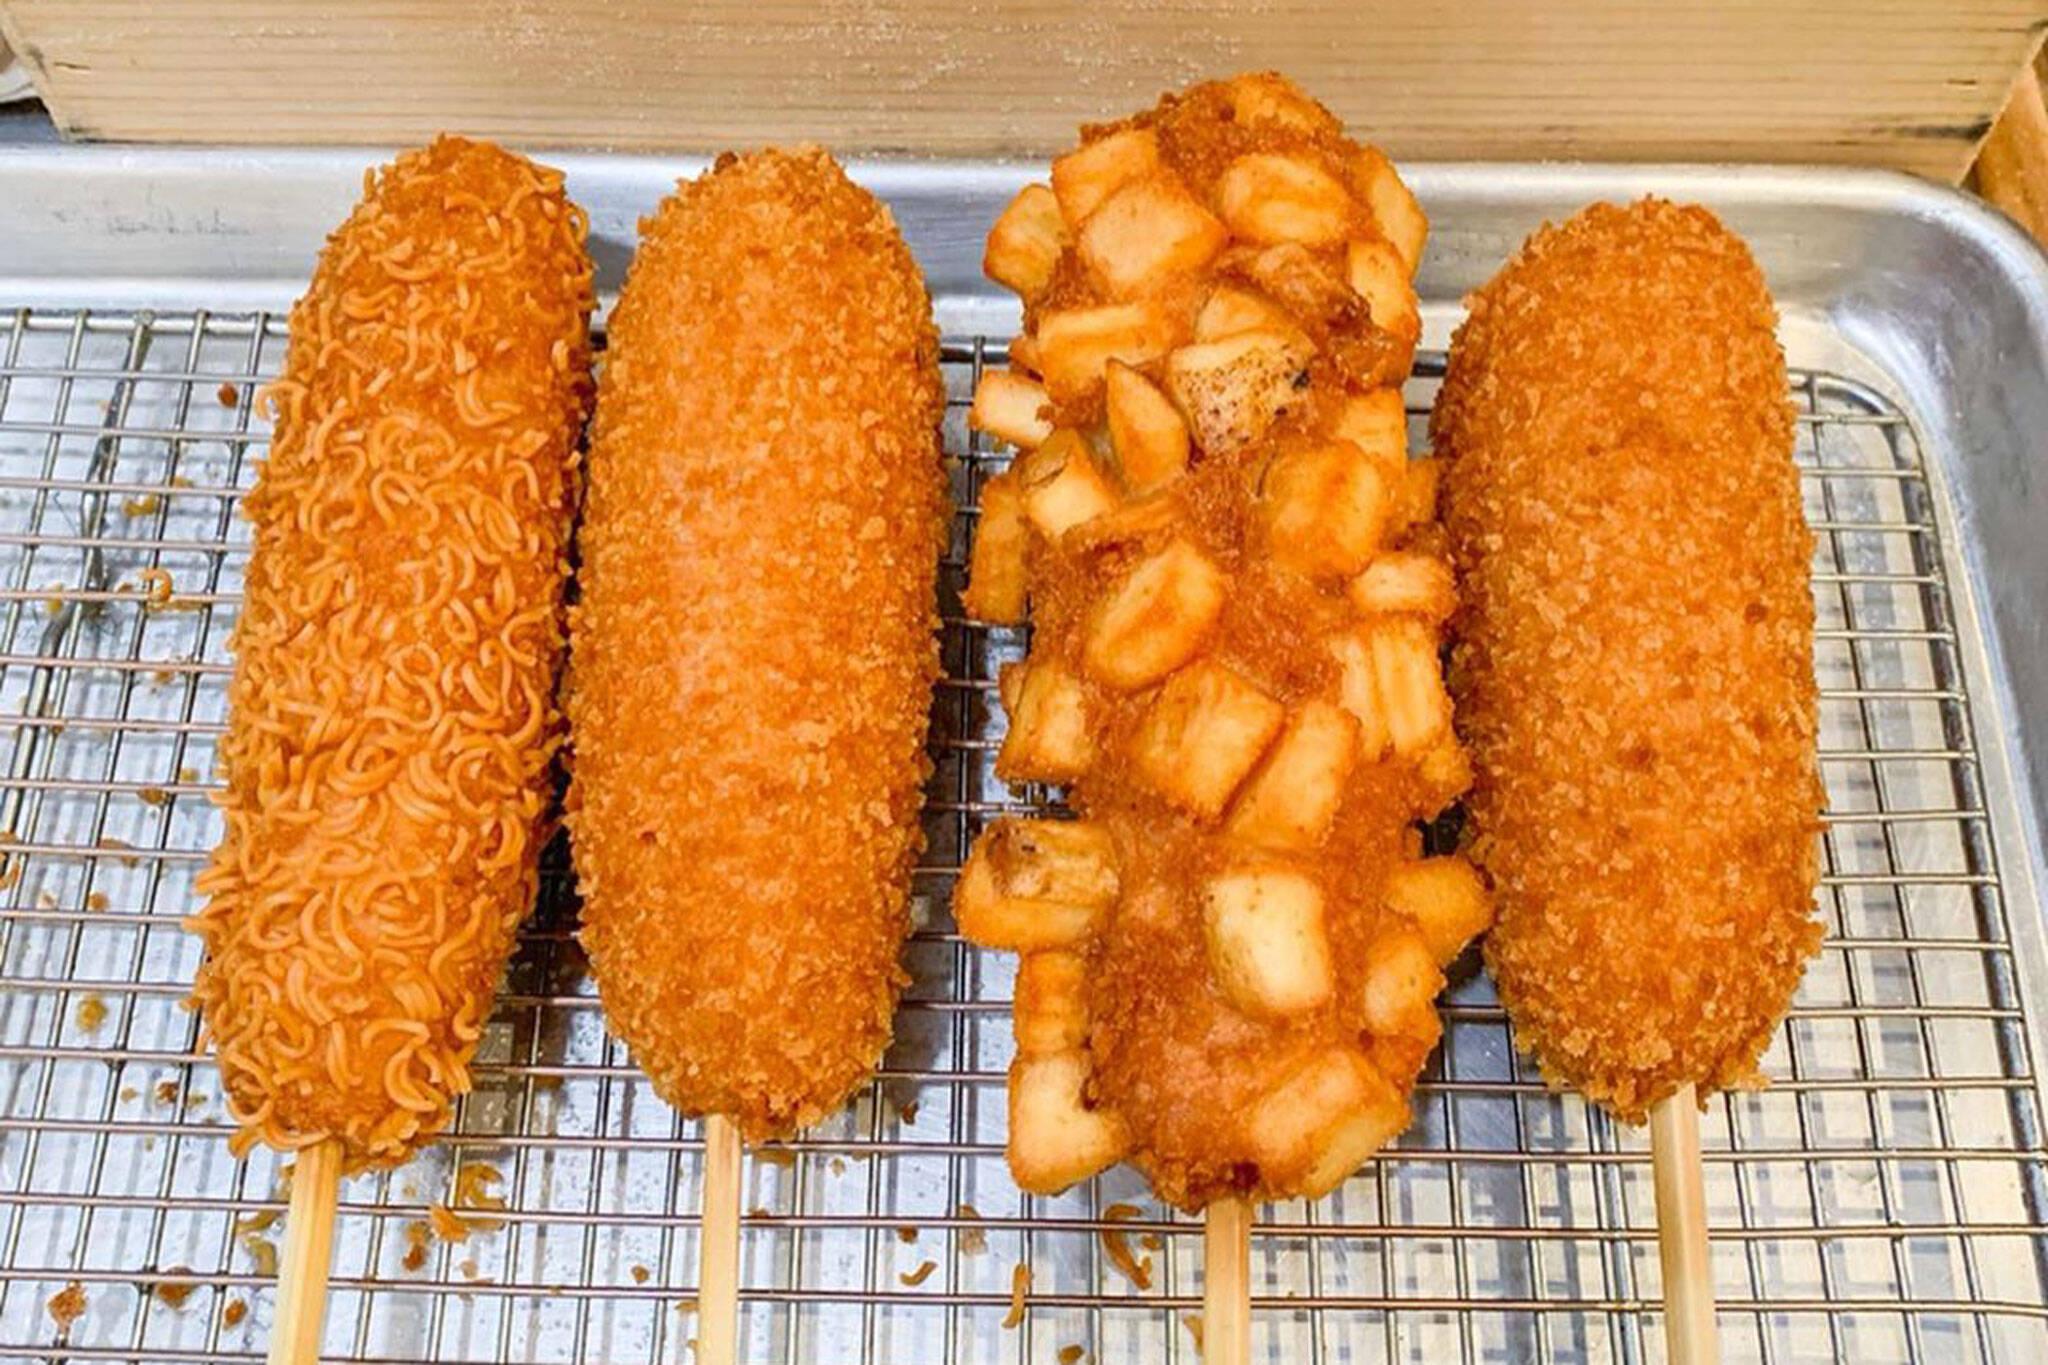 chung chun rice dogs